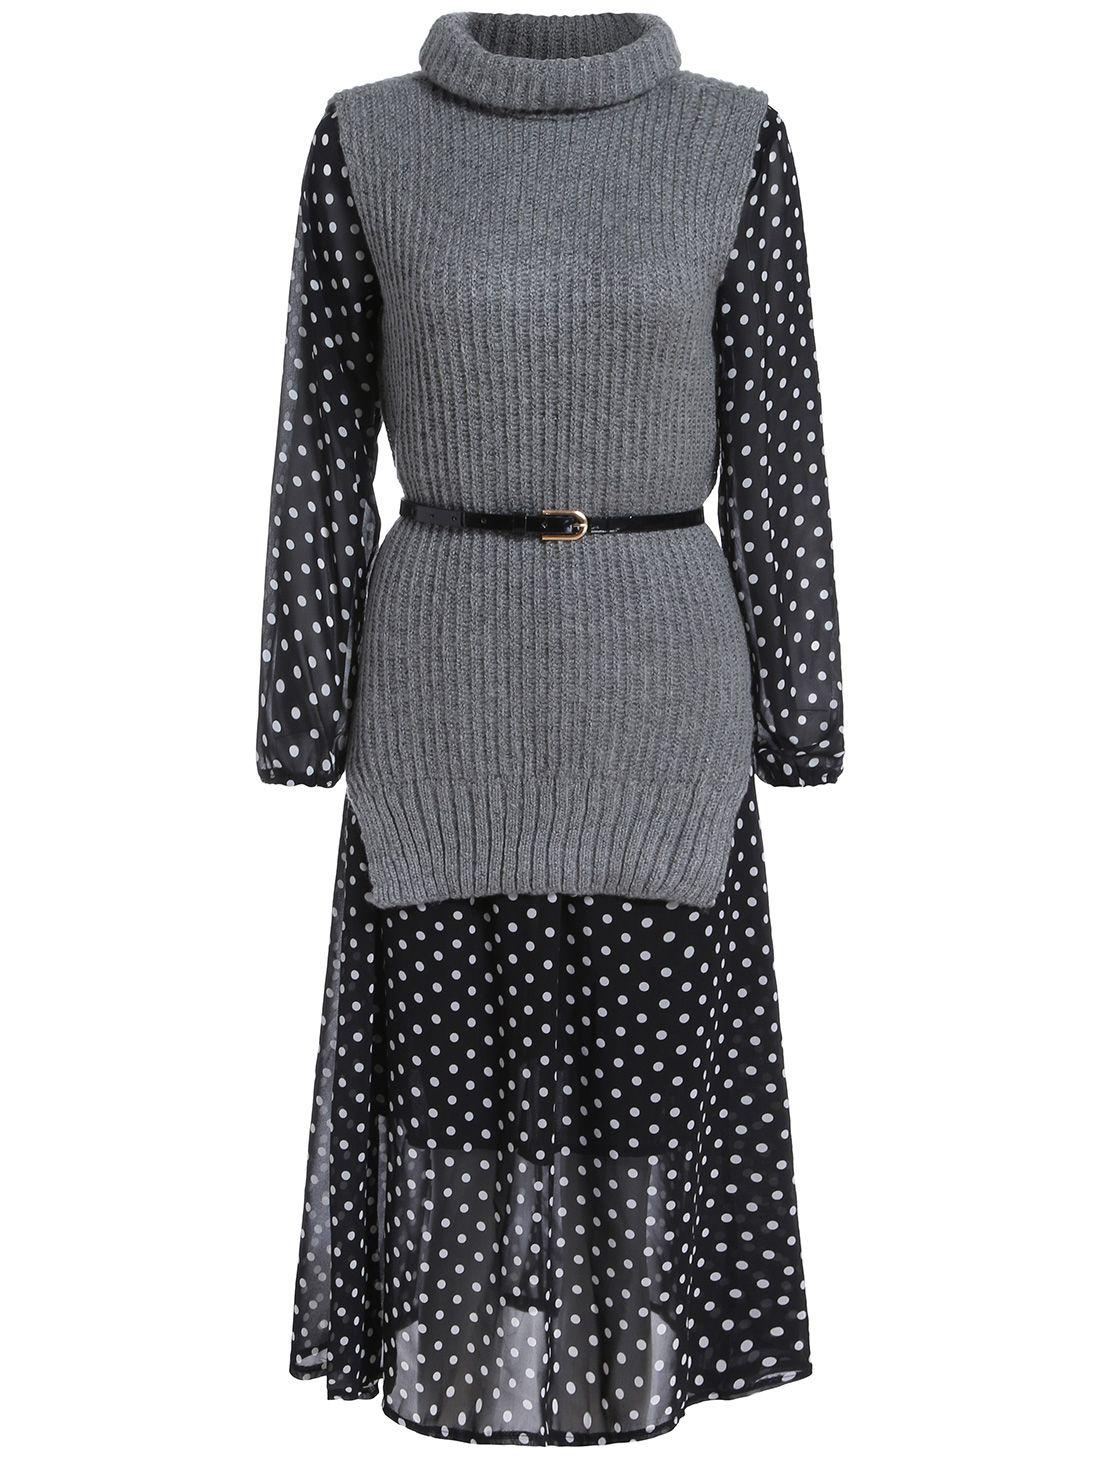 Long Sleeve Polka Dot Dress With Turtleneck Sweater Vest 31.33 ...